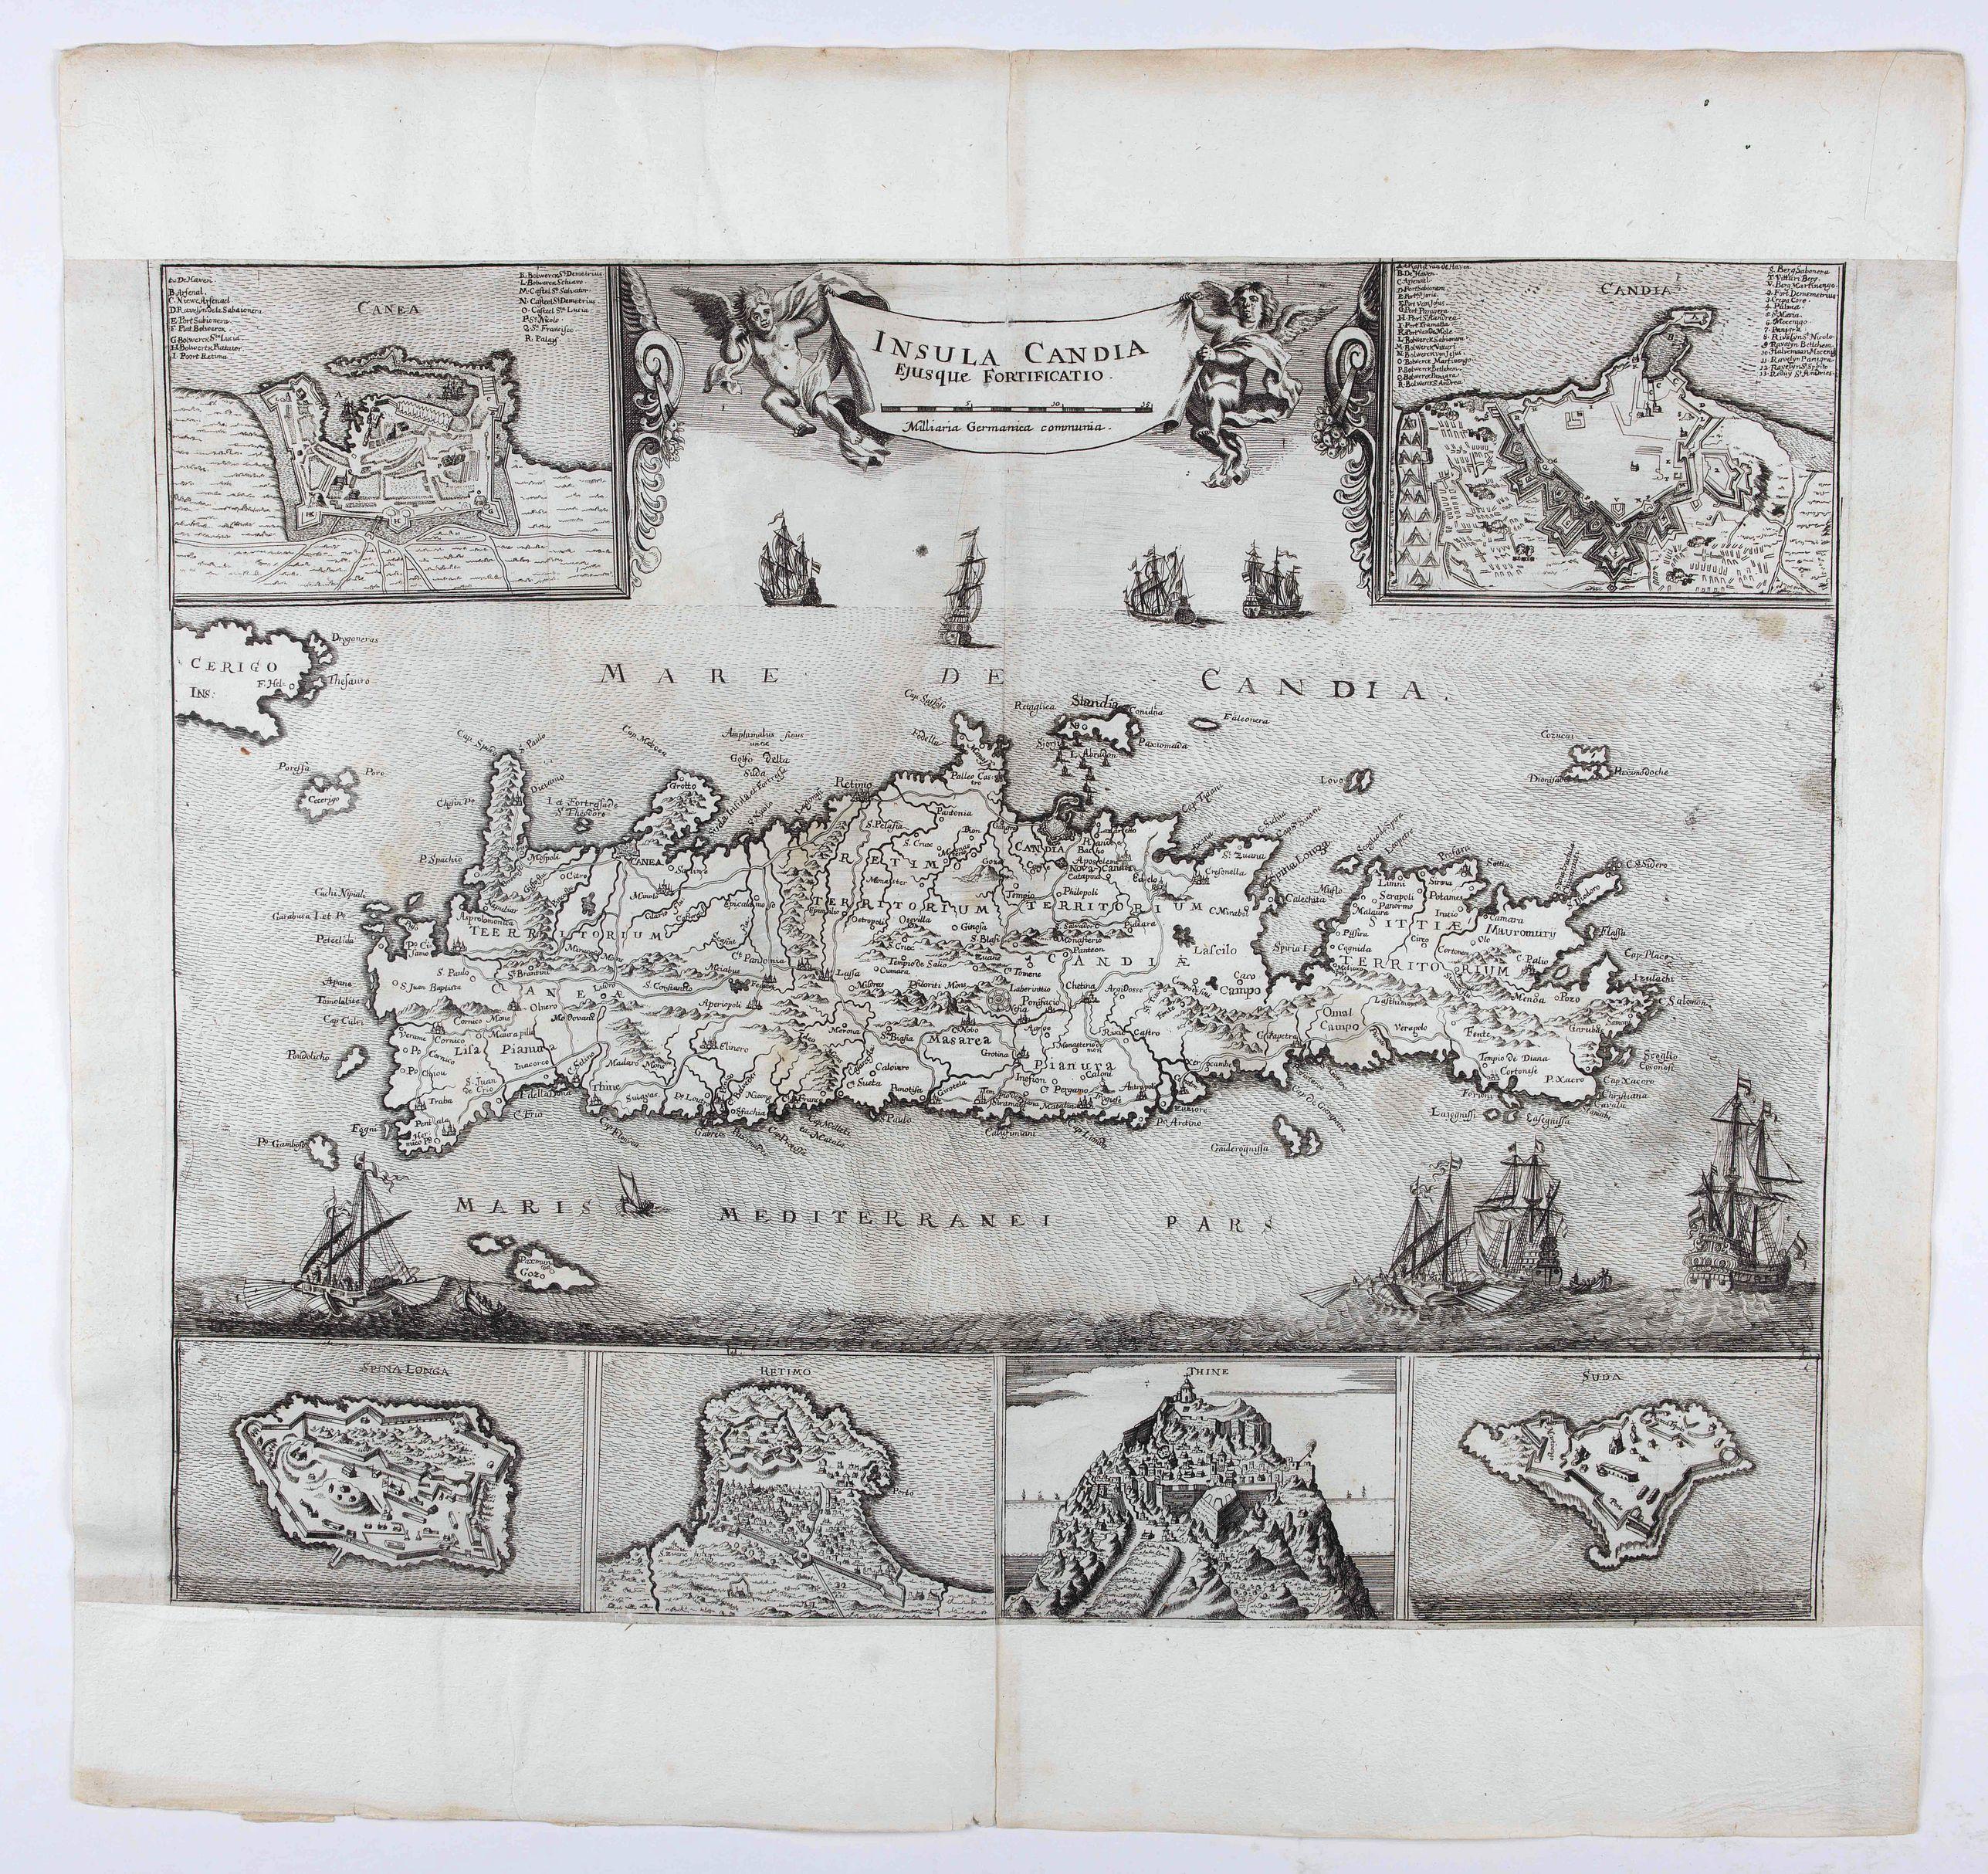 HOFFMANN, J. -  Insula Candia ejusque fortificatio.